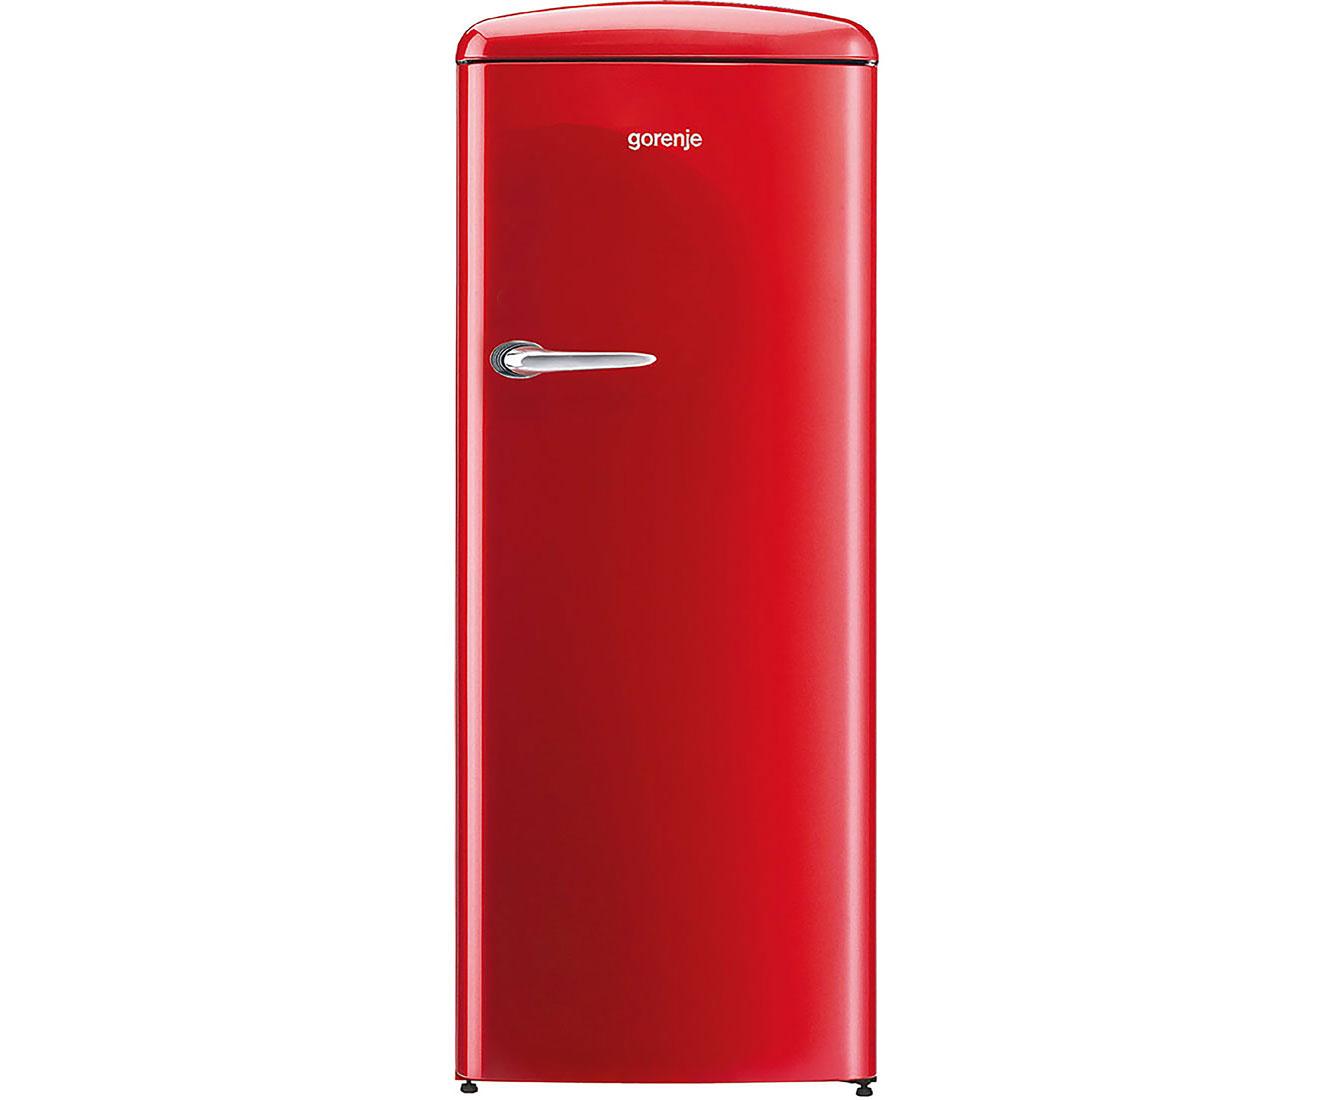 Amica Retro Kühlschrank Test : Test gorenje retro kühlschrank: gorenje obrb r vw bulli retro